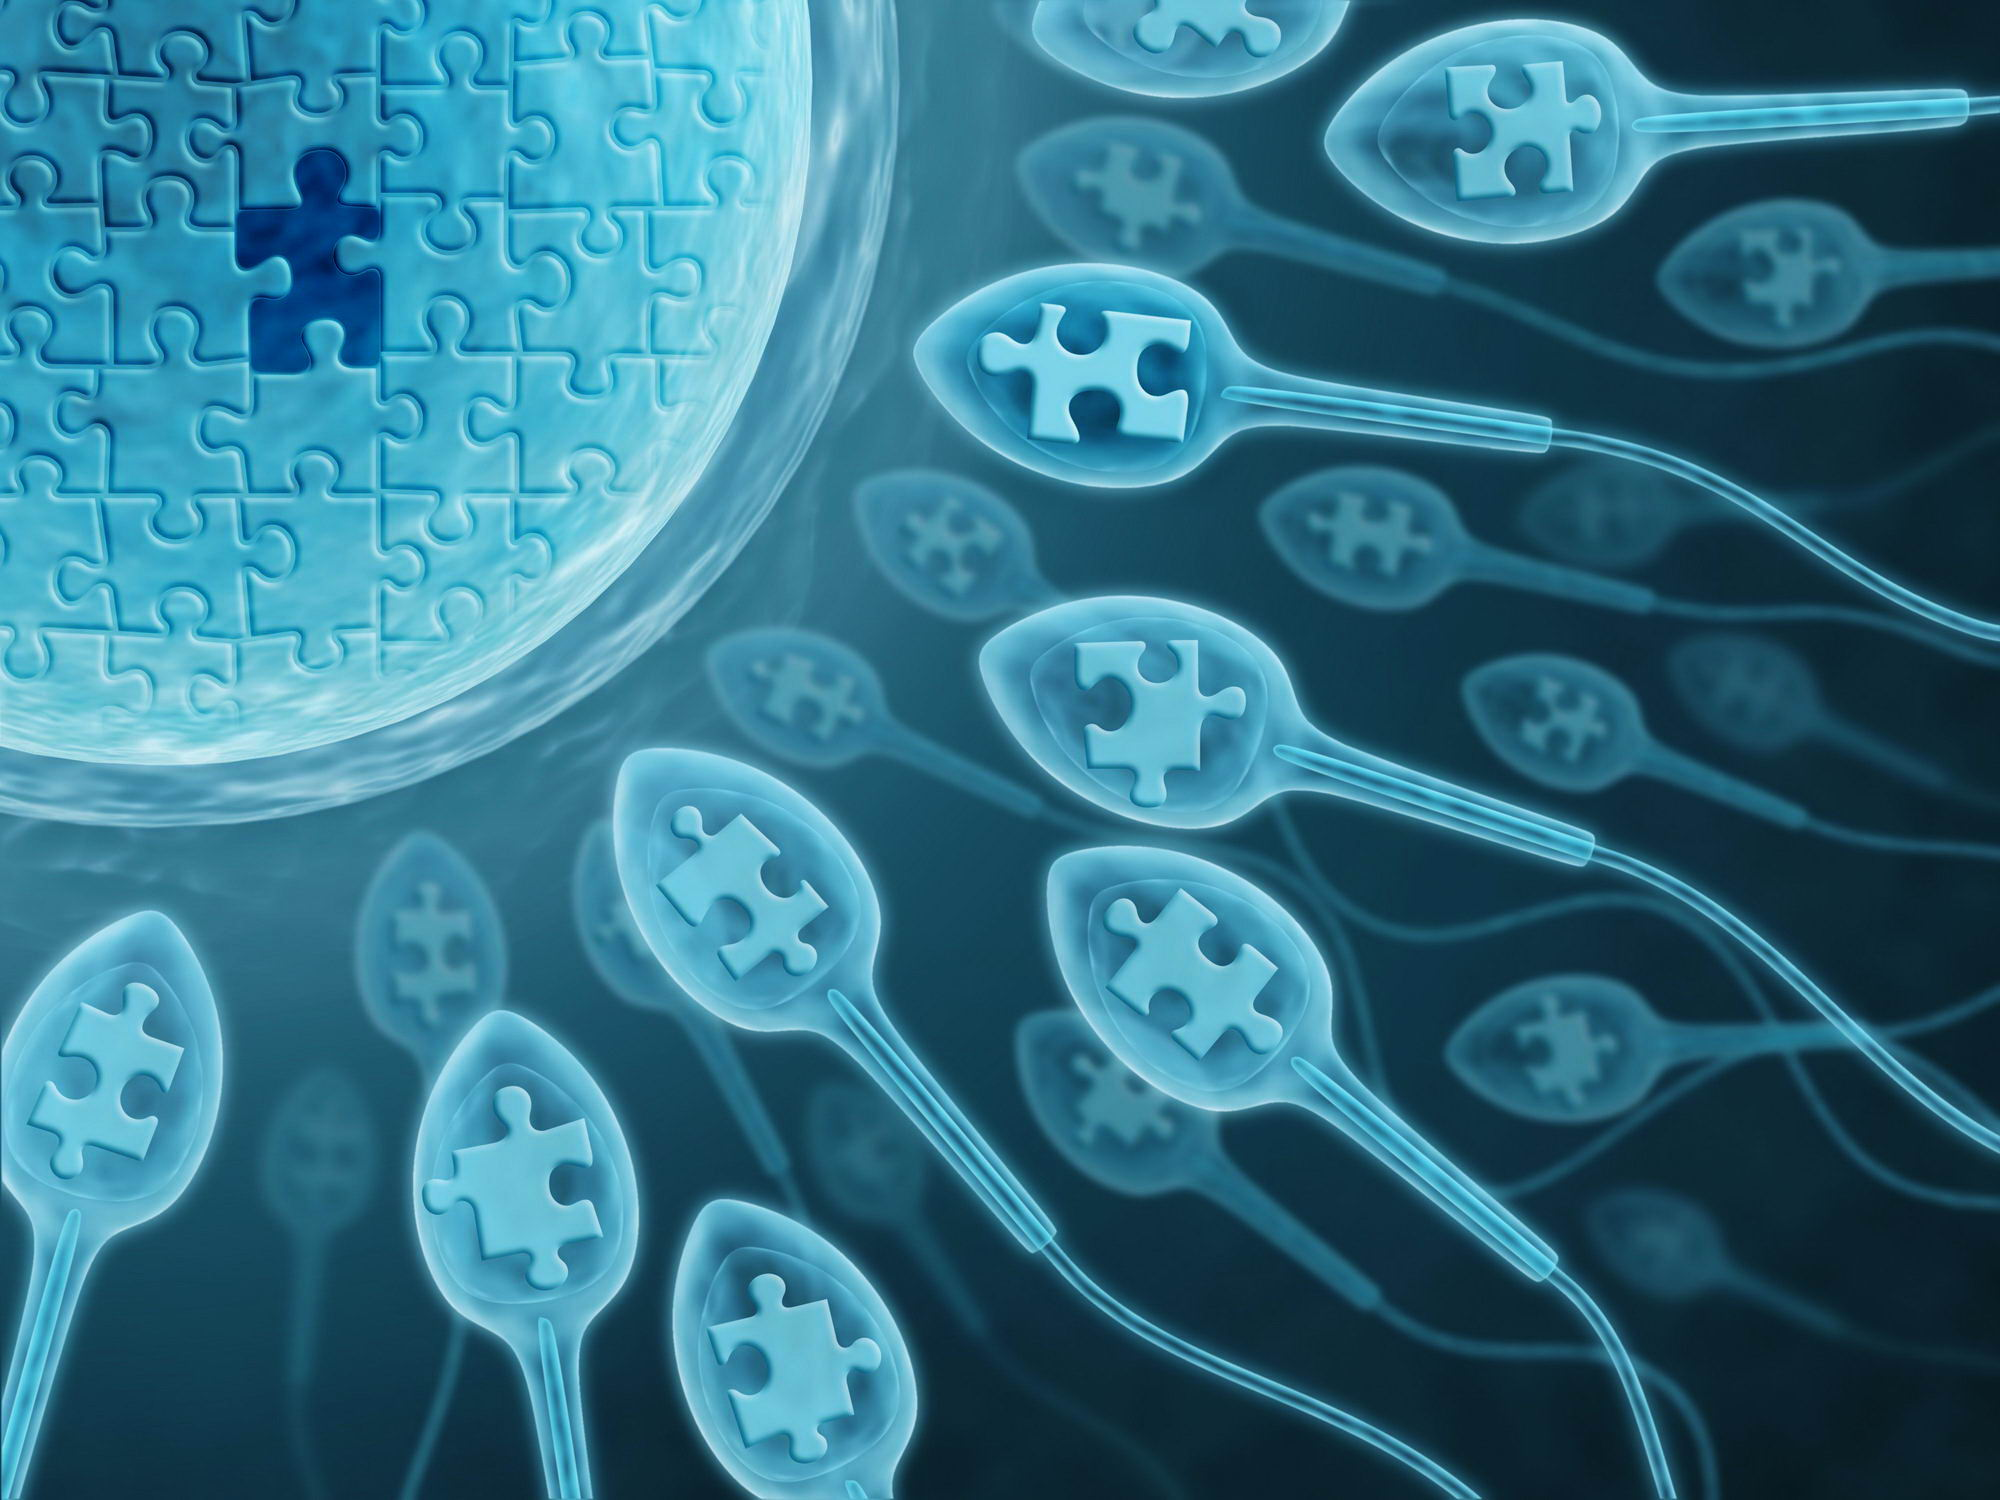 сперматозоиды пазл